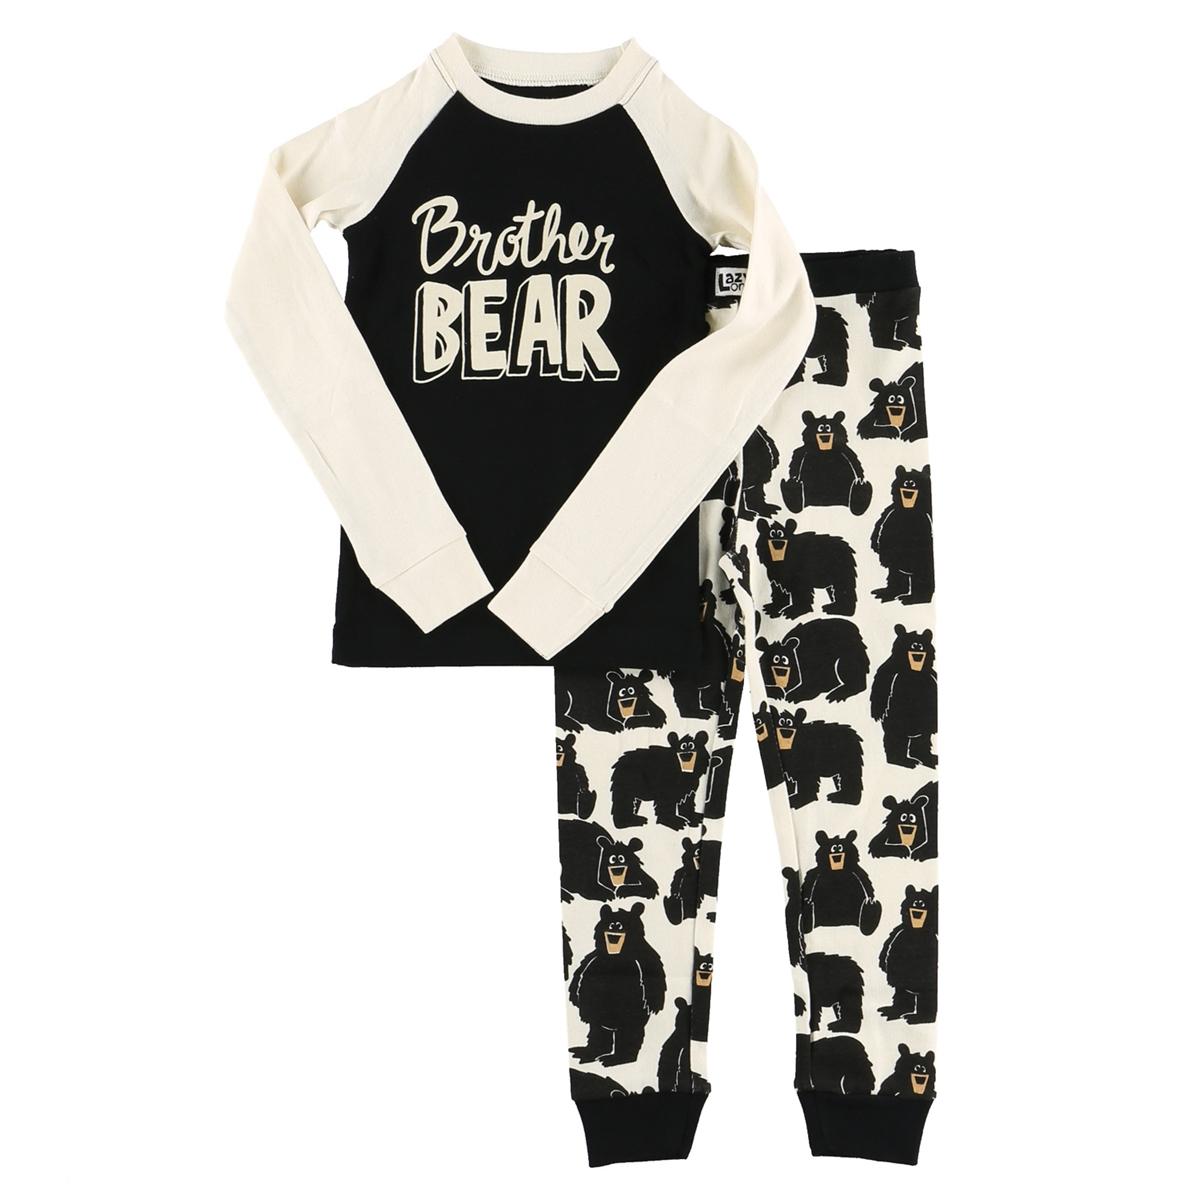 Brother Bear Pajama Set